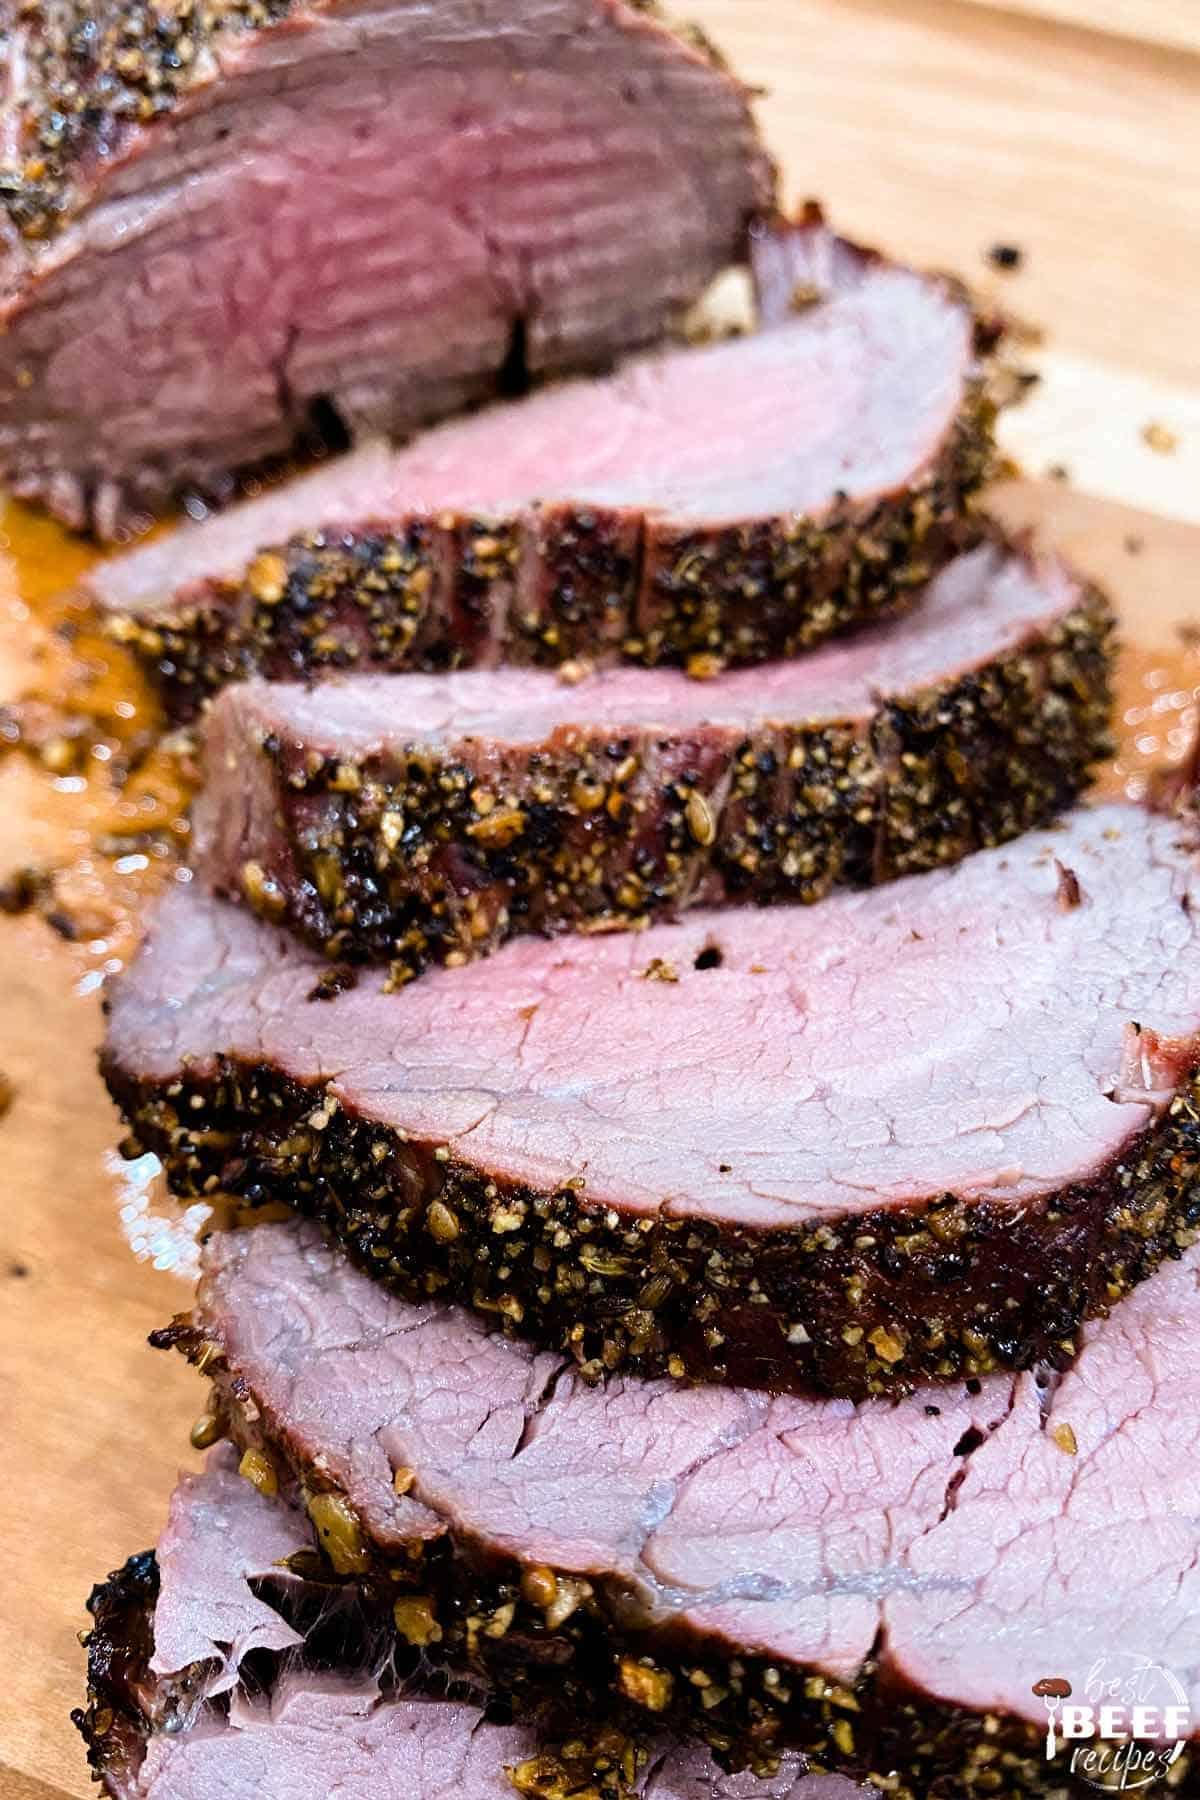 Sliced beef tenderloin on a cutting board up close